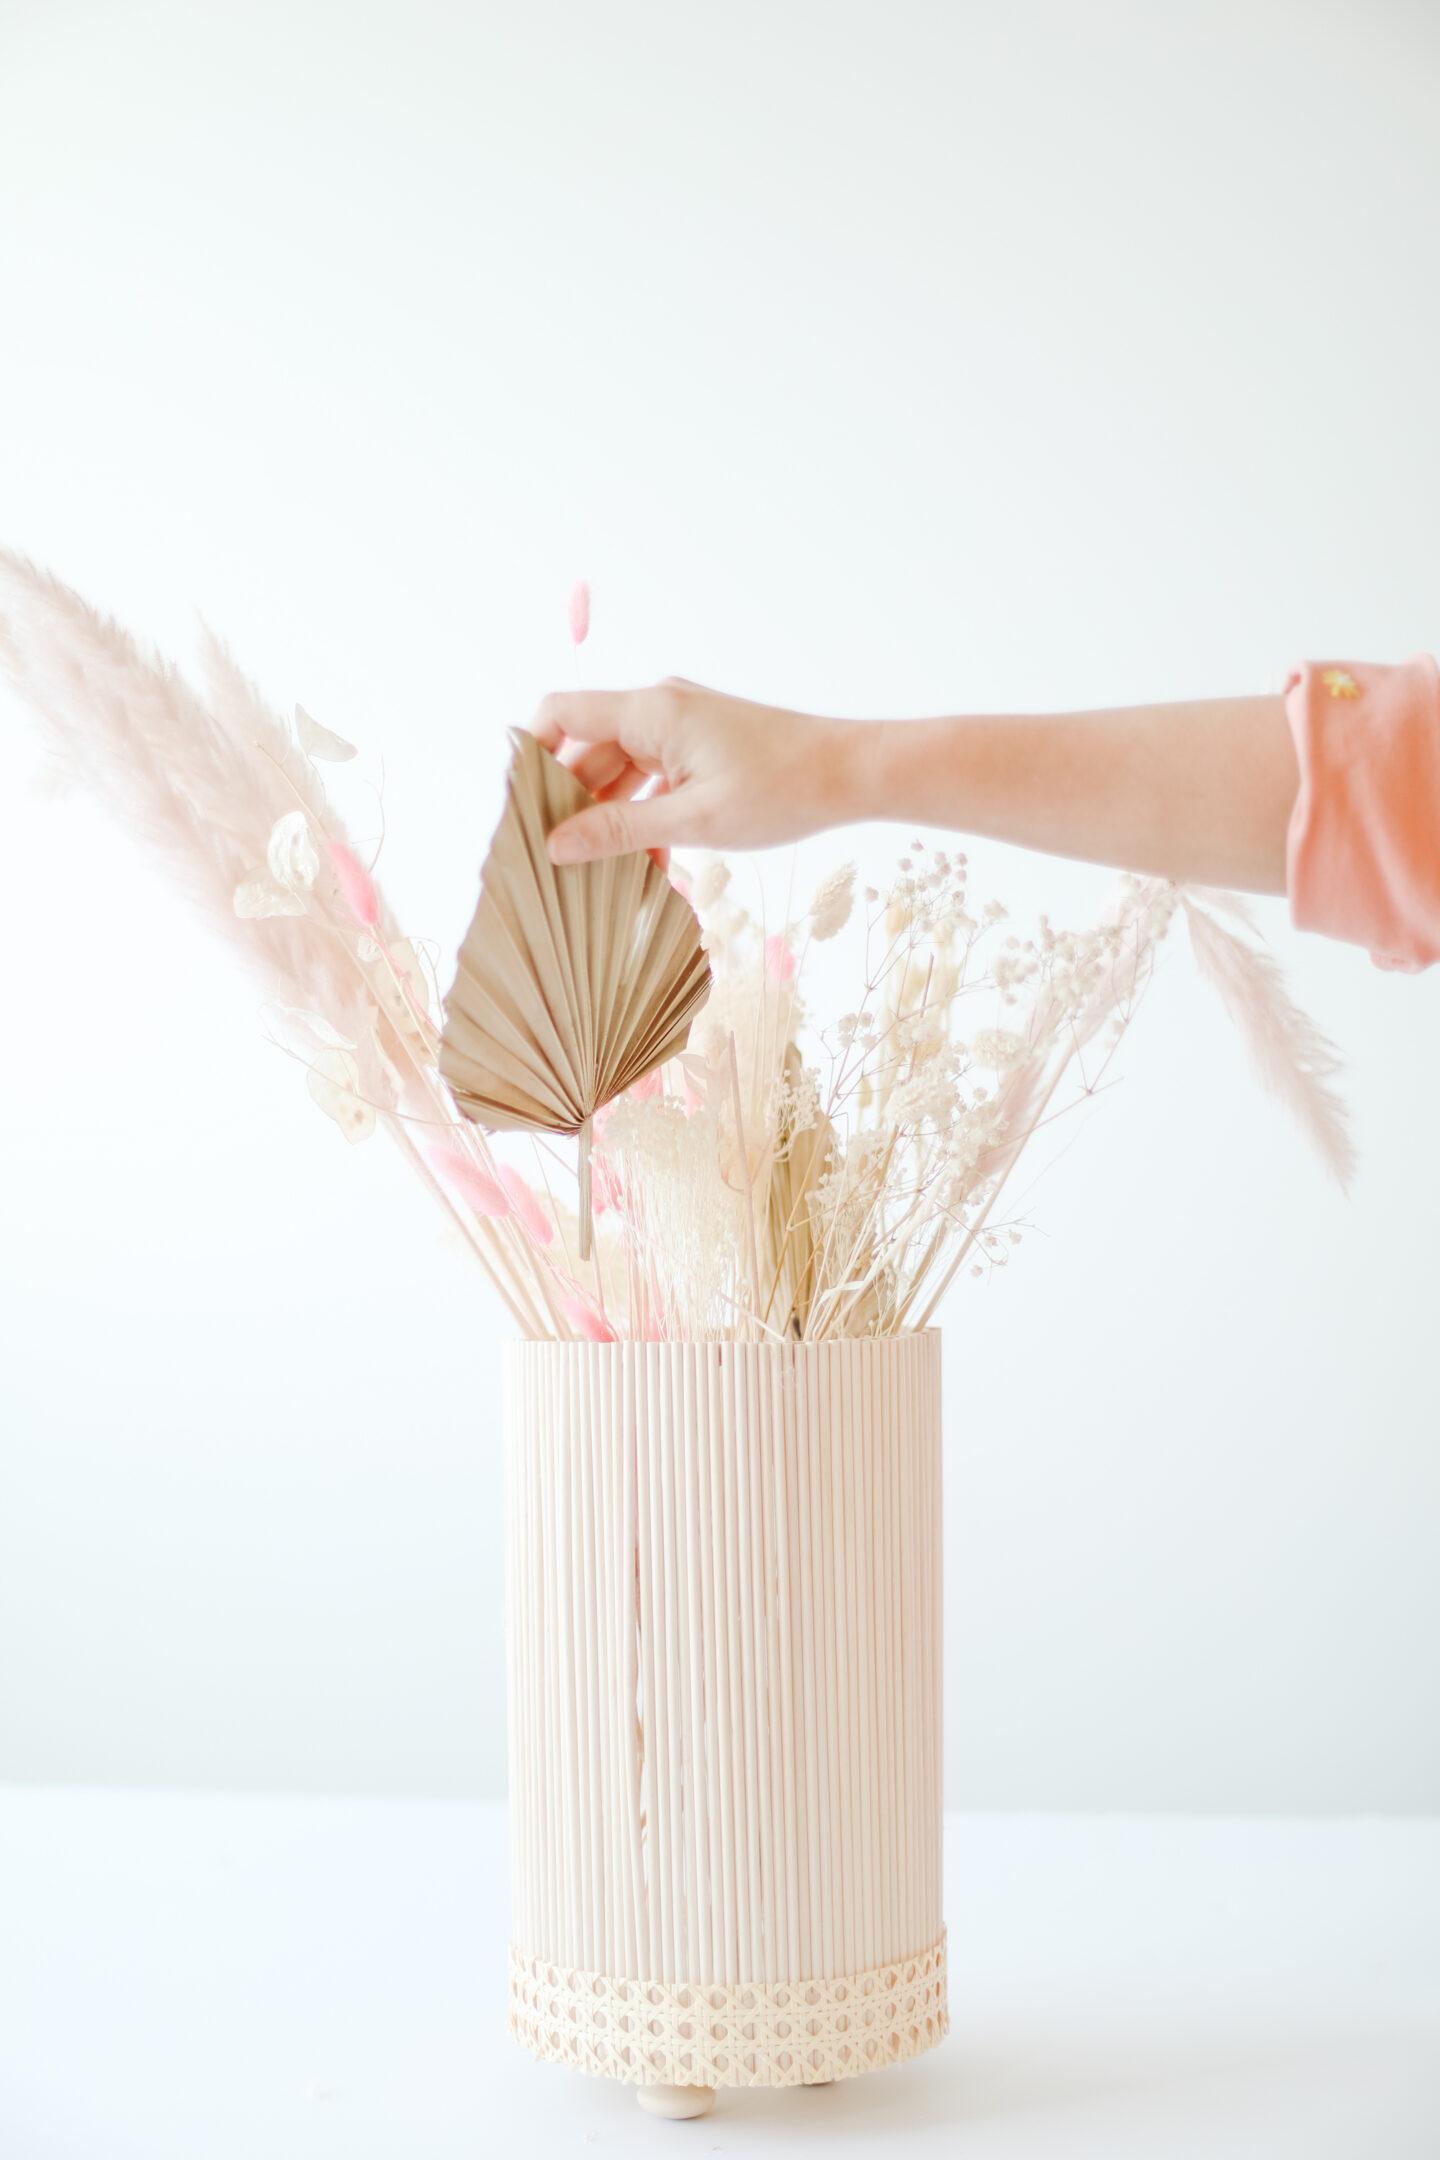 Scandi wooden vase DIY project